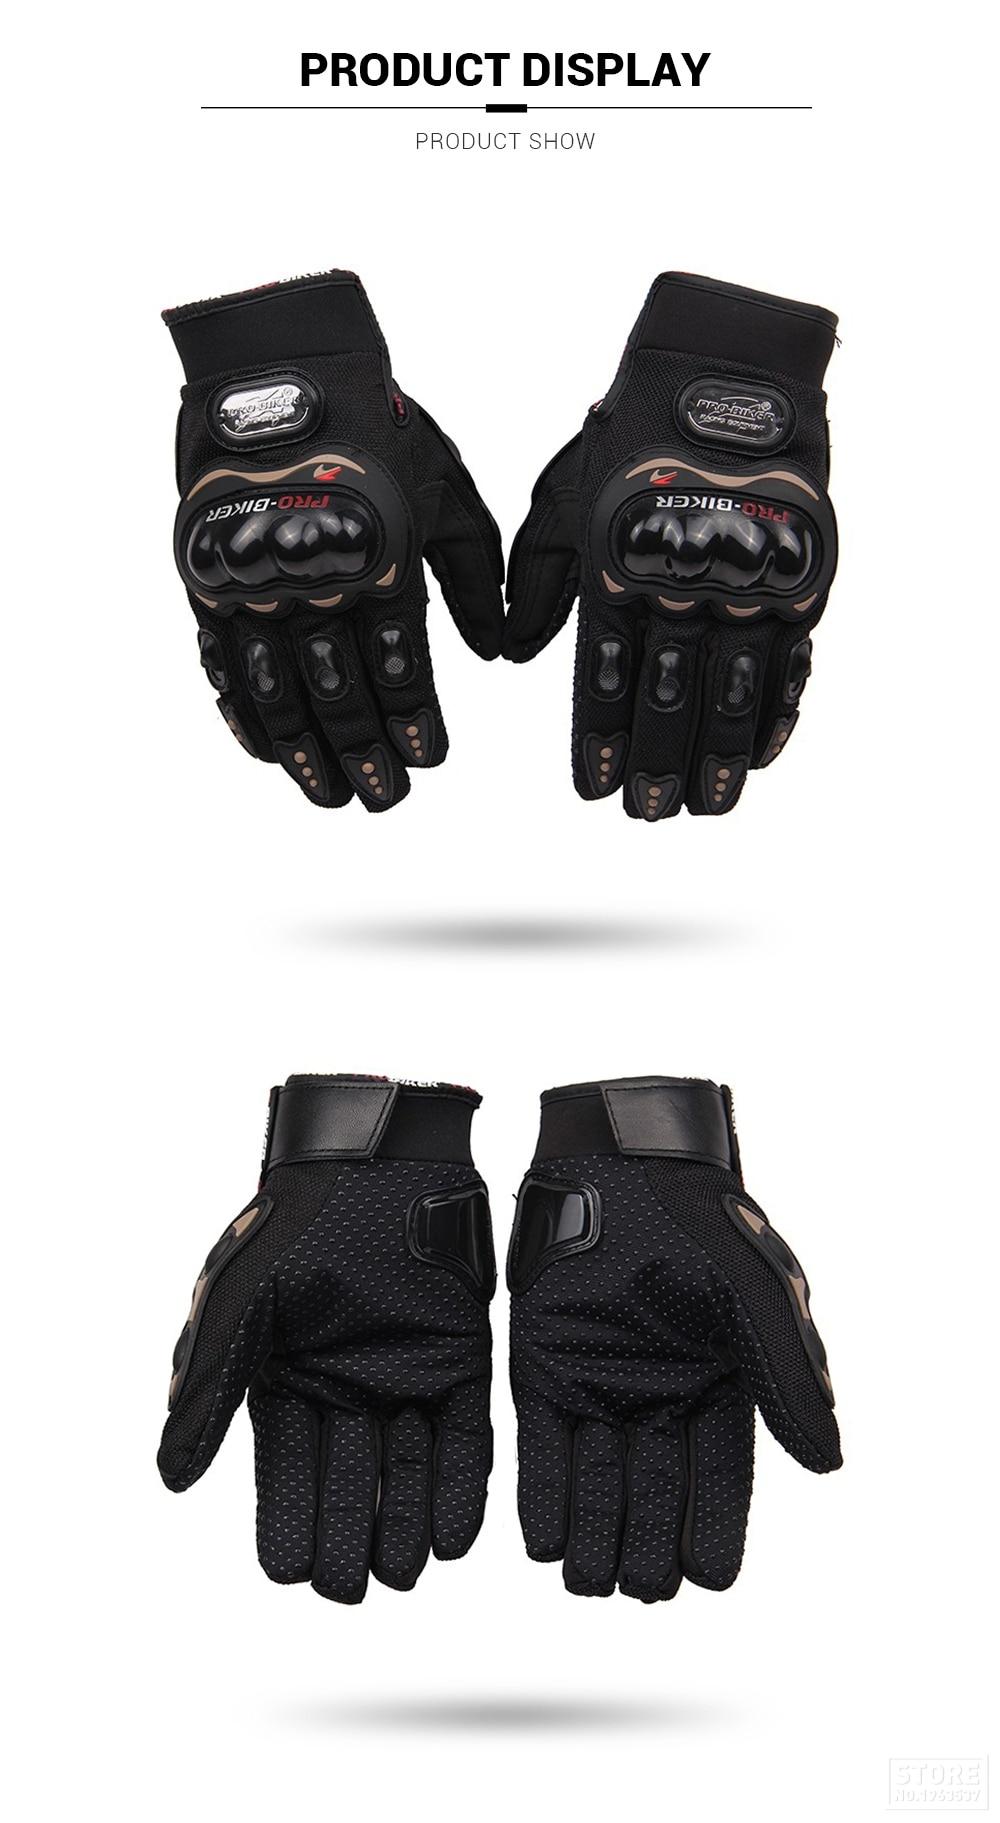 Gloves Pro-Biker Collection (22) 24